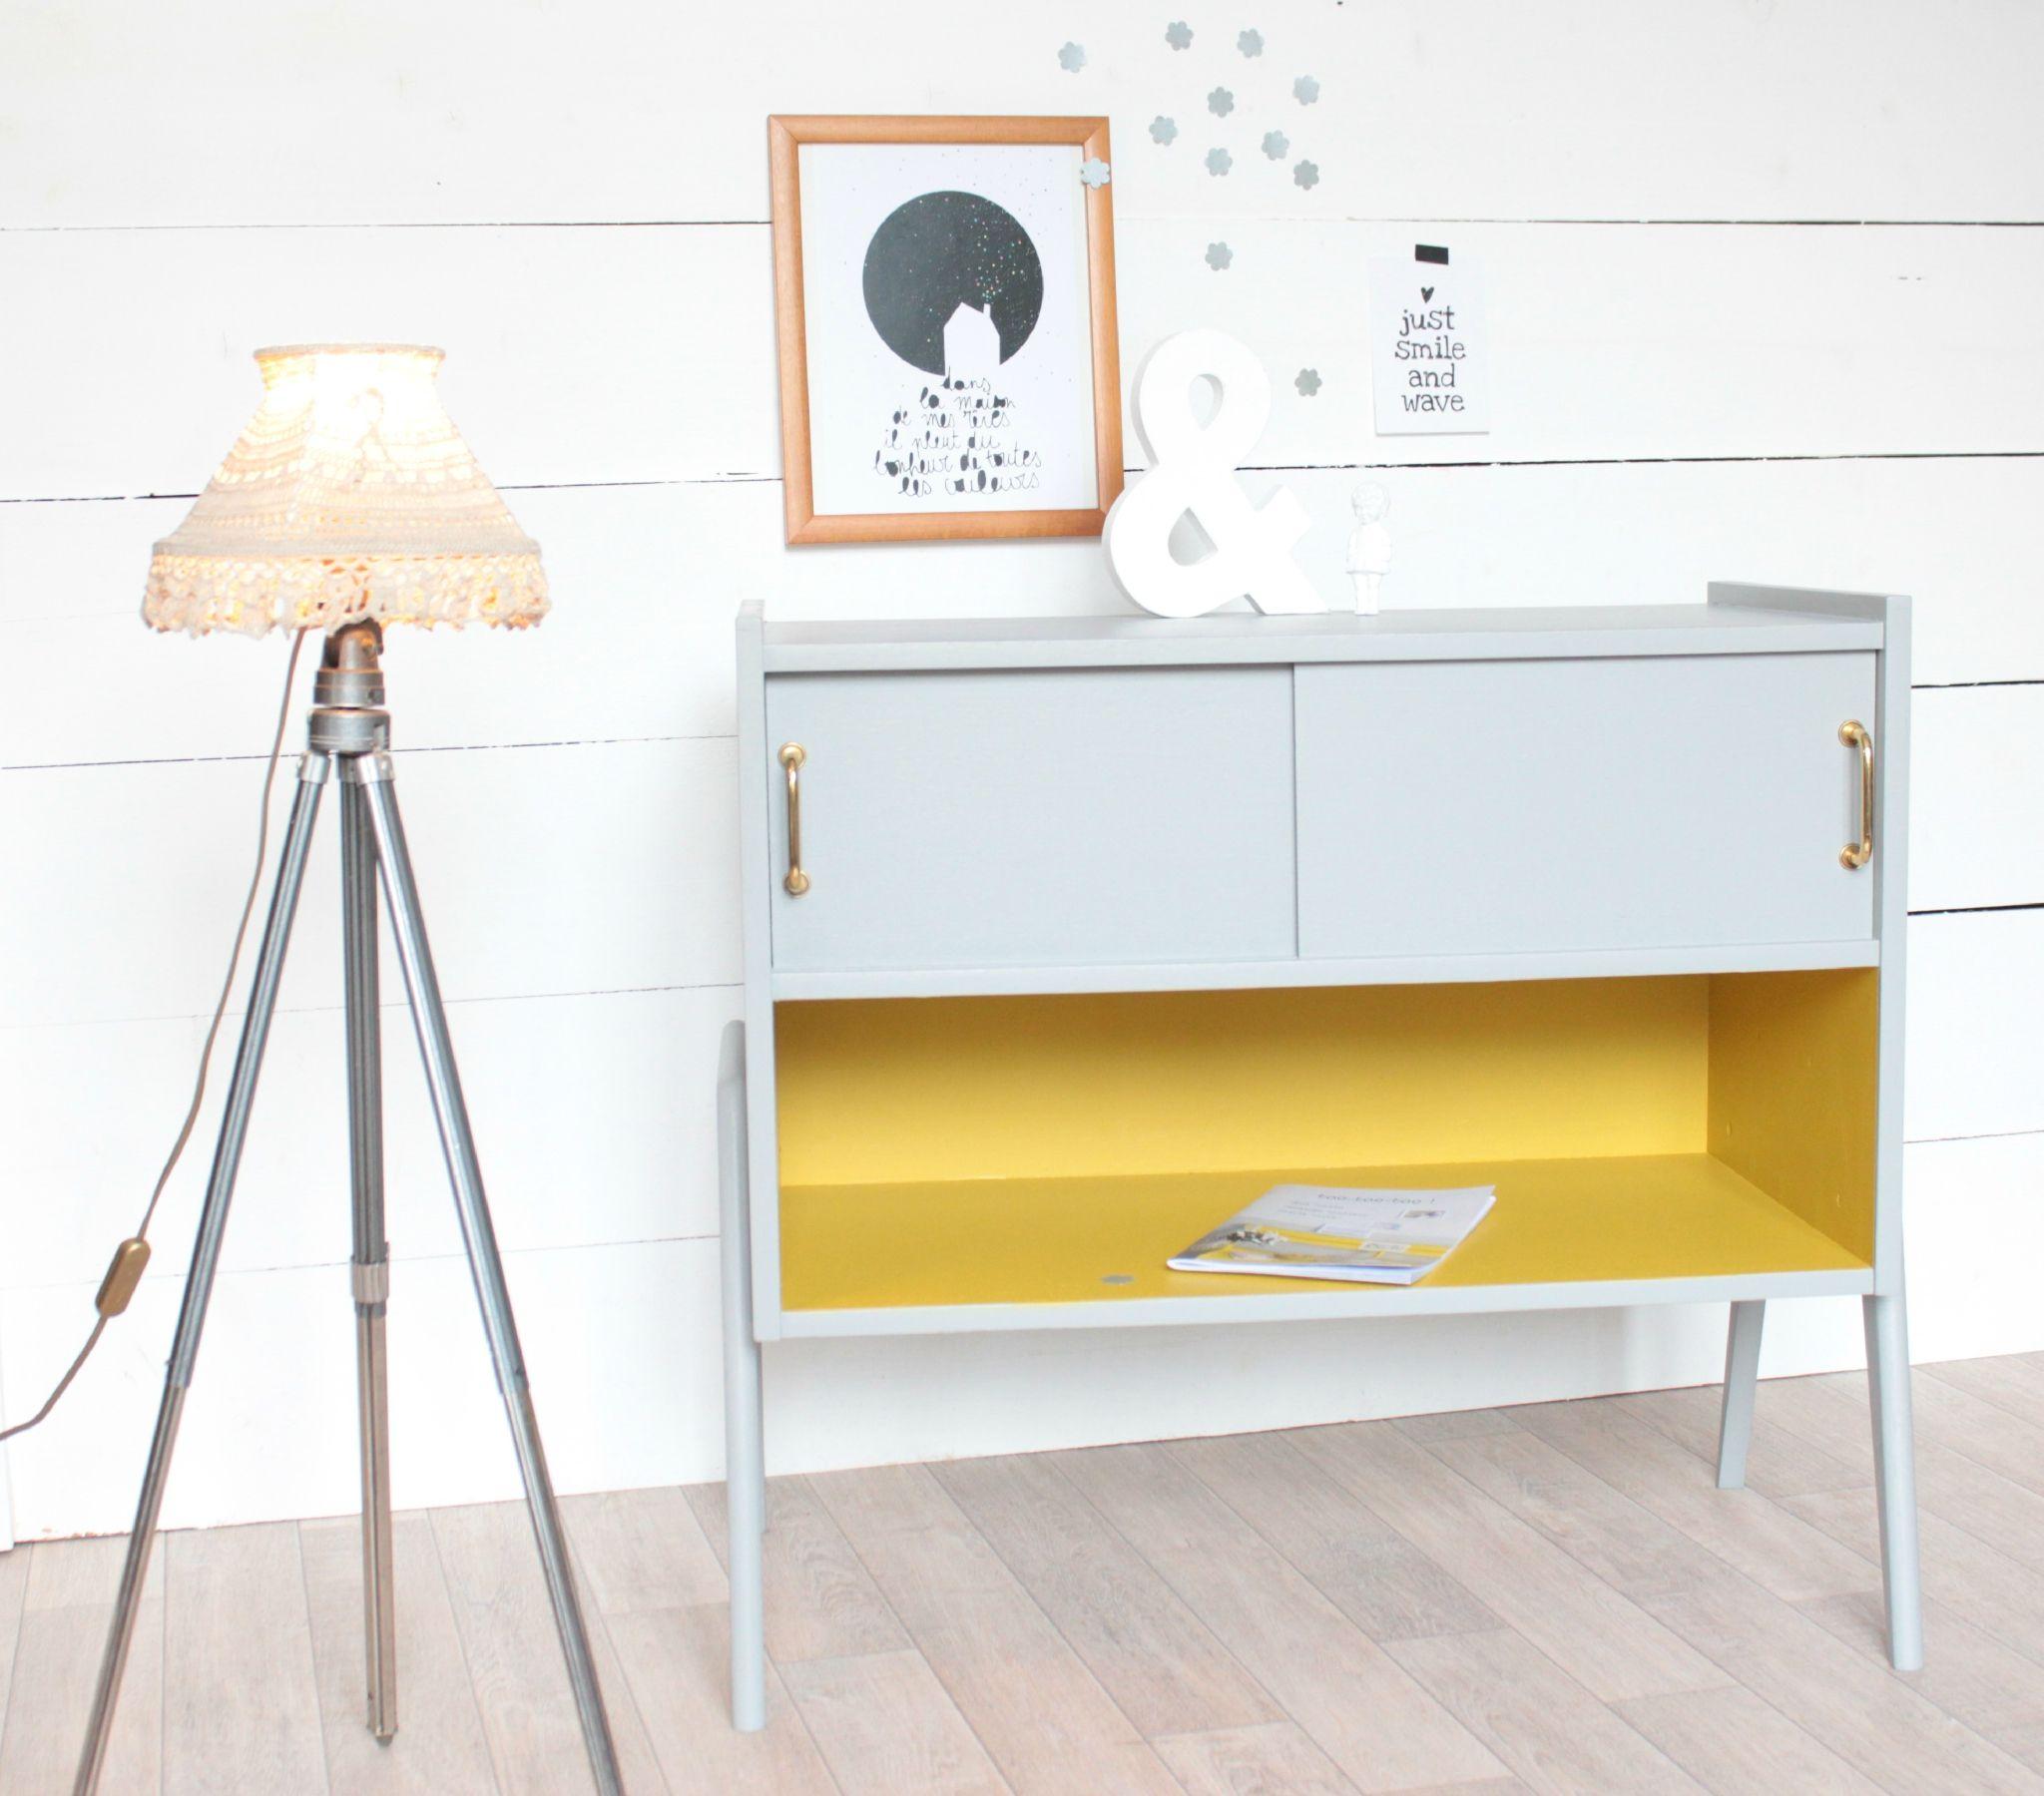 Petite Commode Années Gris Jaune Trendy Little - Trendy painted furniture